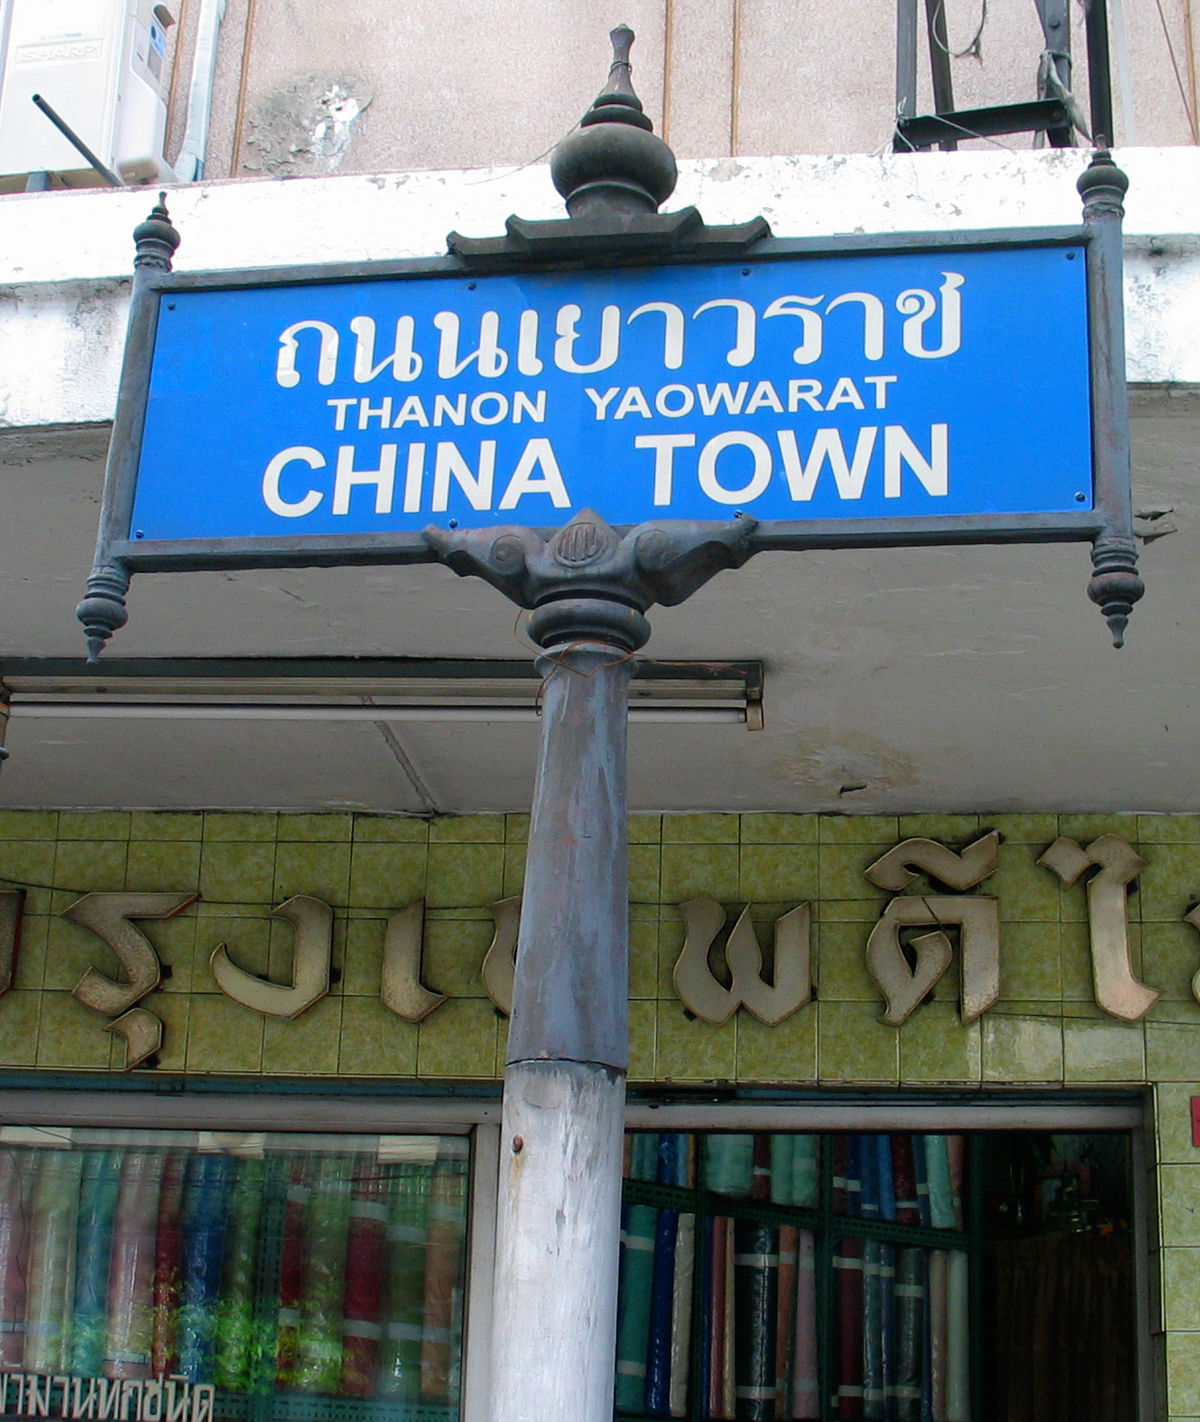 Thai addressing system - Wikipedia